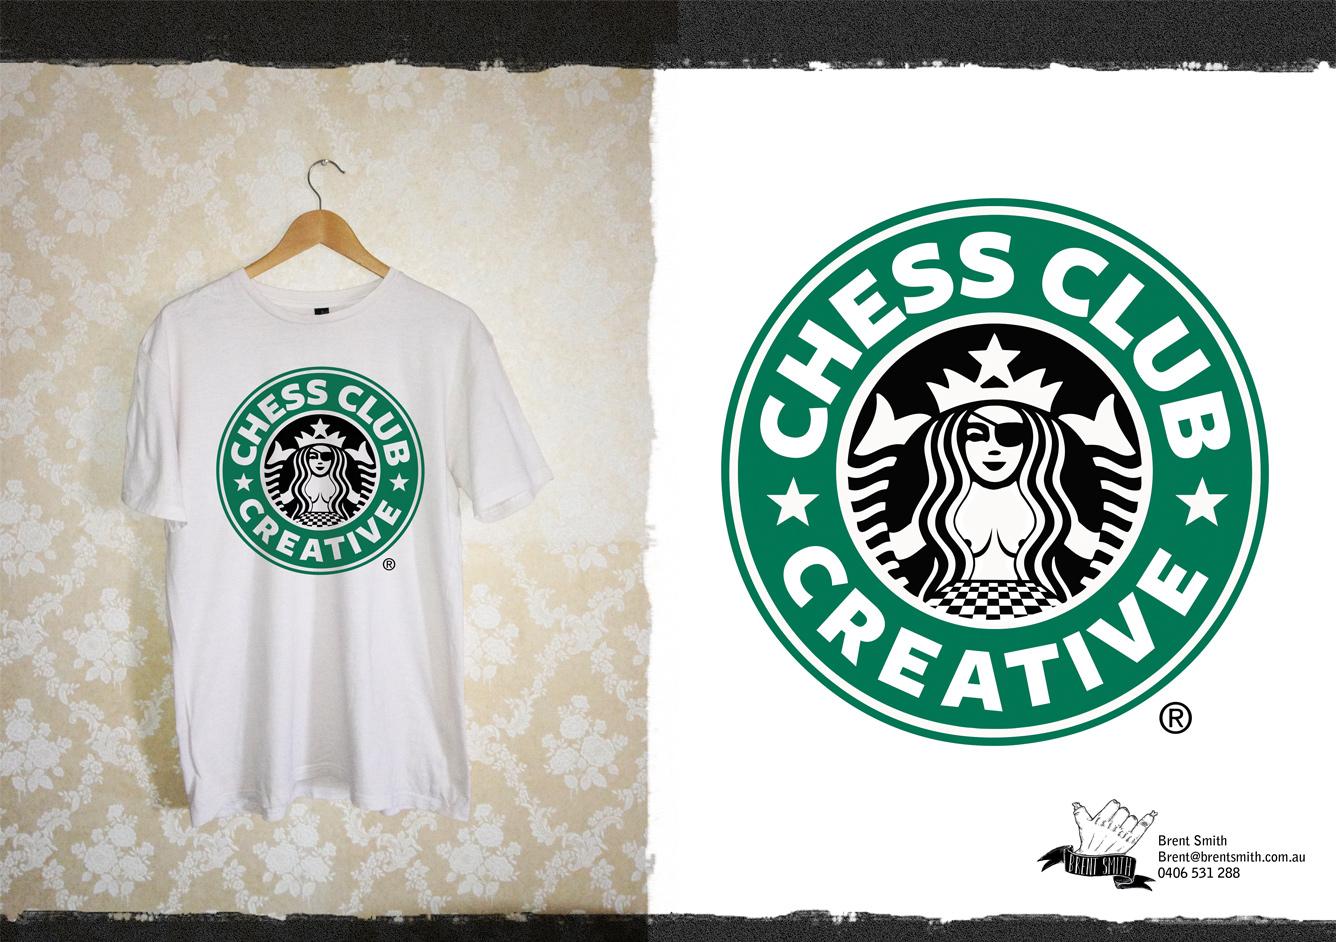 CHESS-CLUB-COLLECTIVE.STARSCHMUCKS